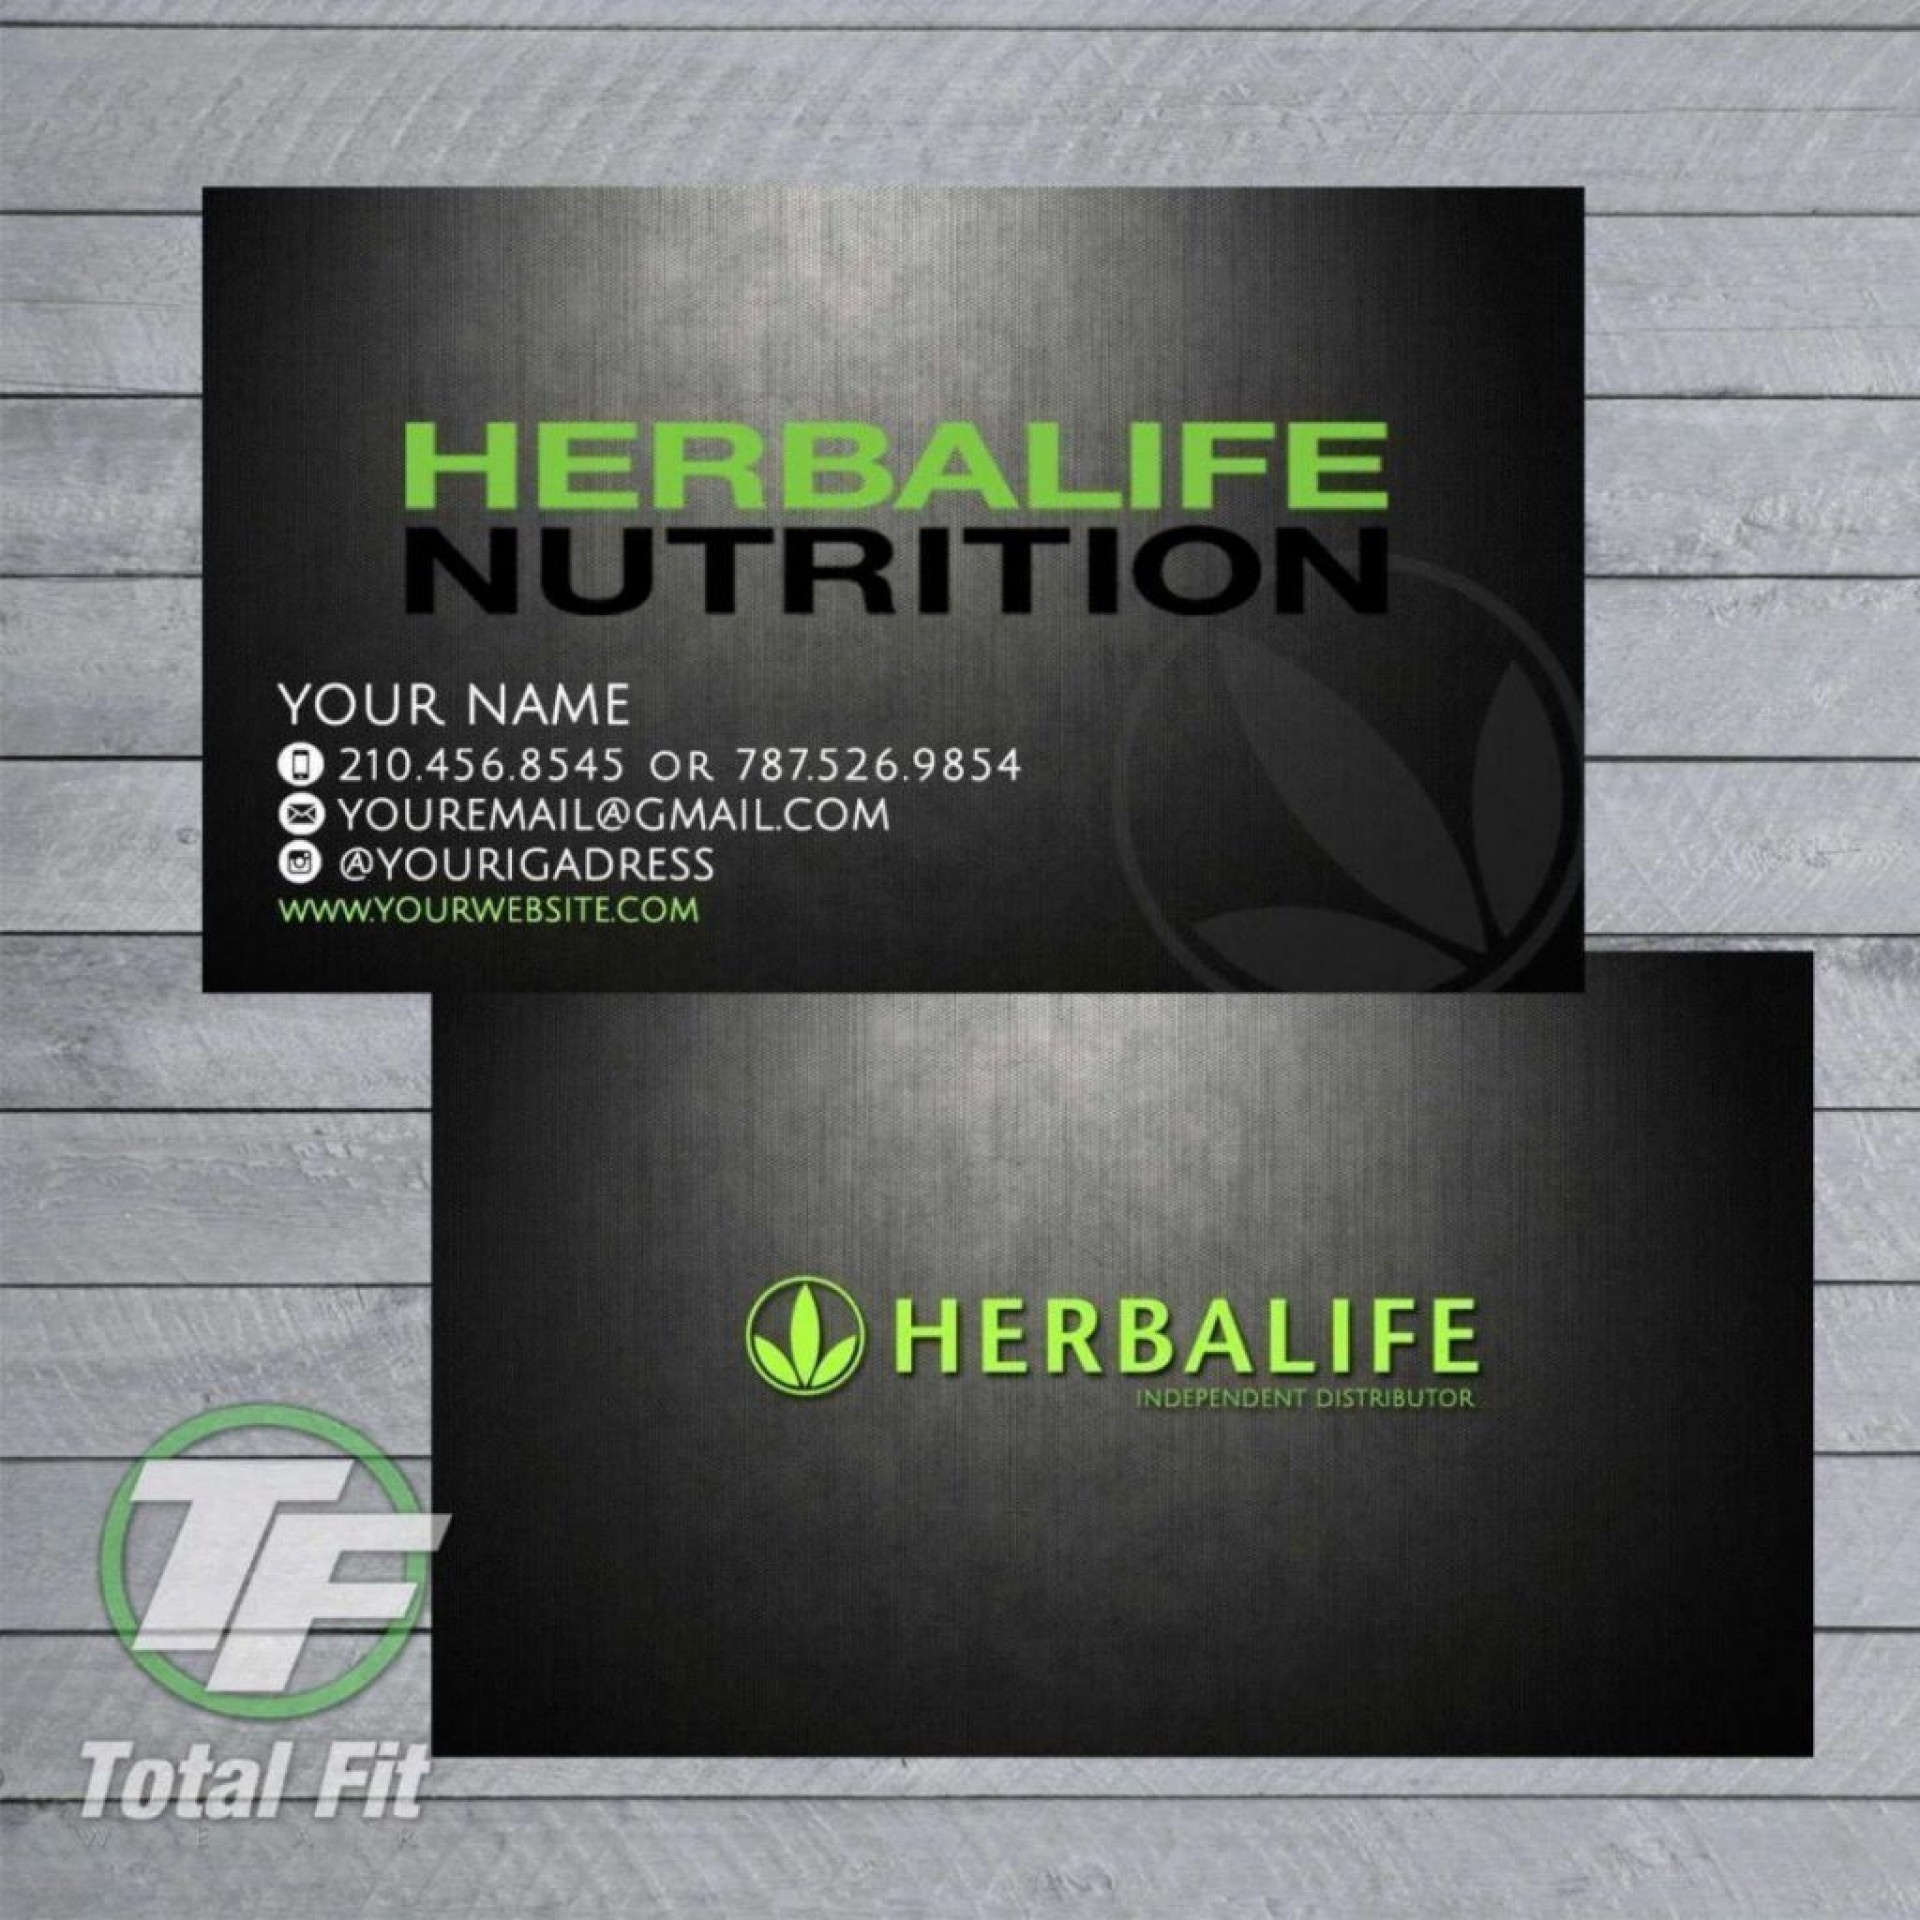 009 Unbelievable Herbalife Busines Card Template Photo  Download Free1920